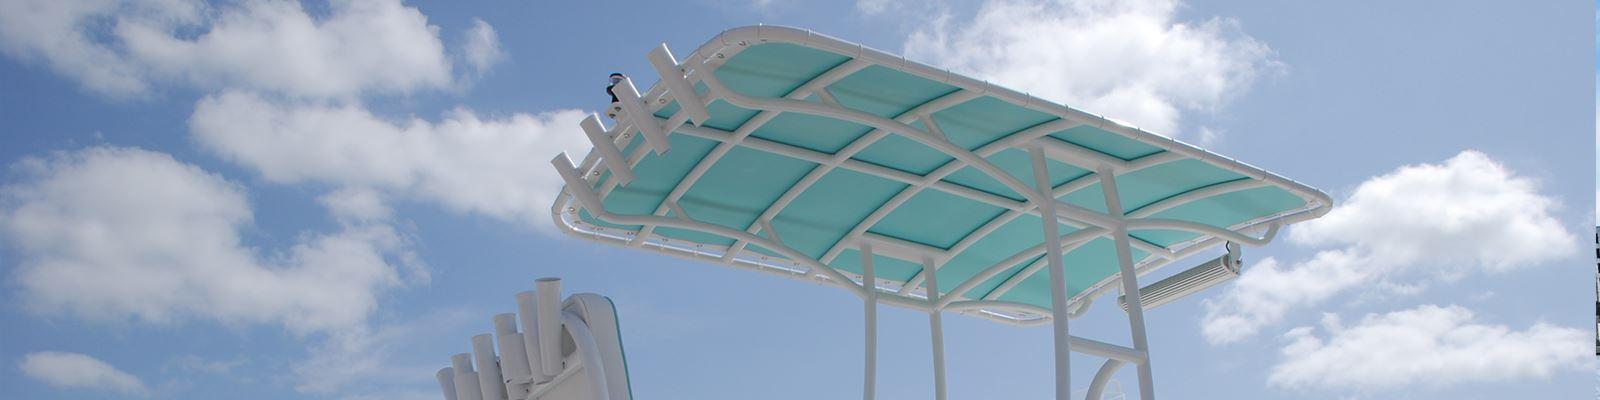 tower-fabrication-rod-holders-f31-2240